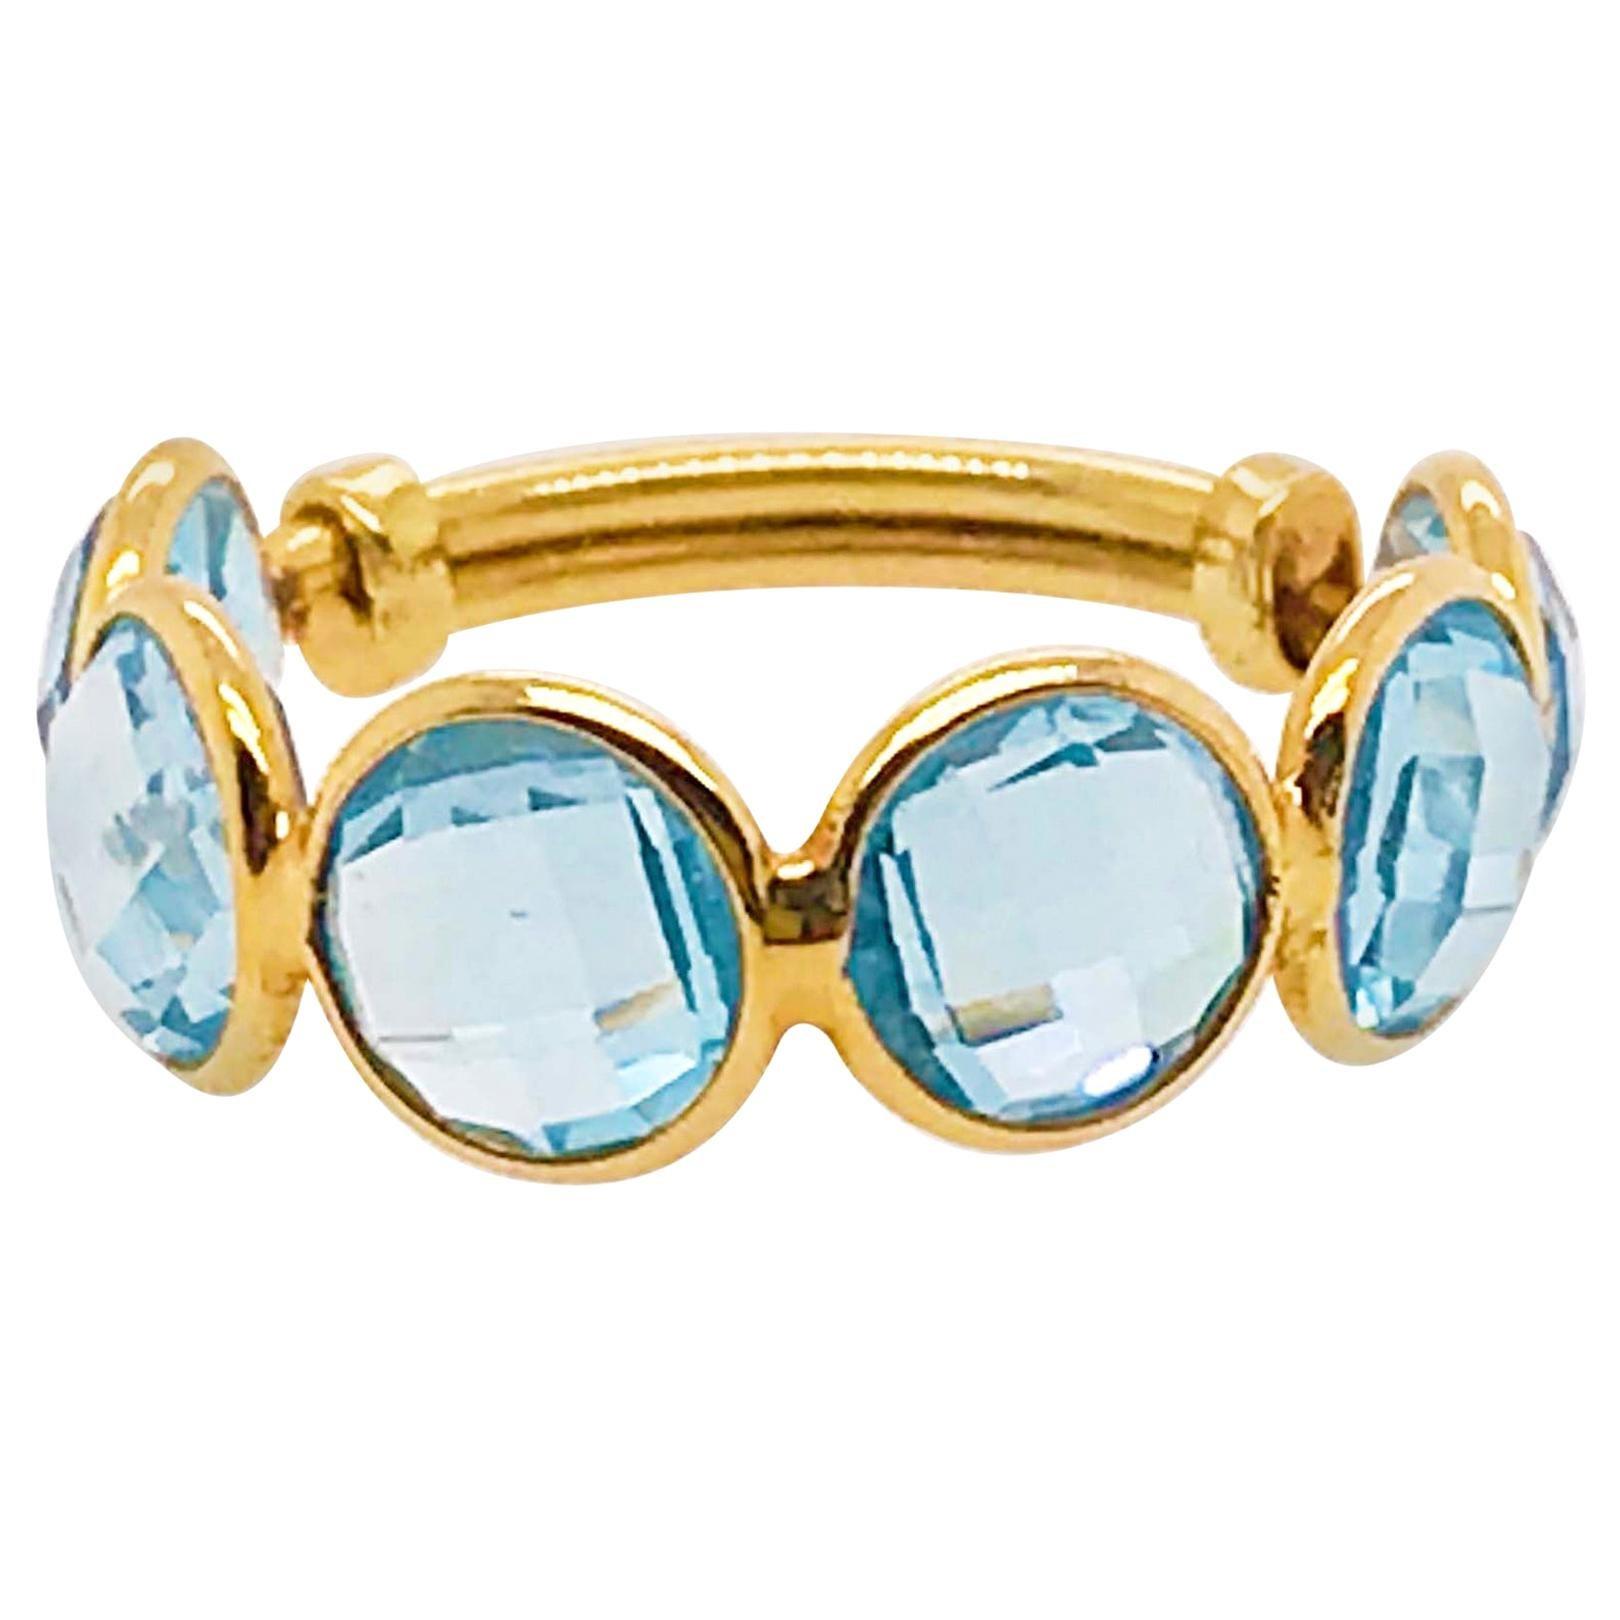 Original 18 Karat Gold Blue Topaz Gemstone Adjustable Band, 18 Karat Yellow Gold